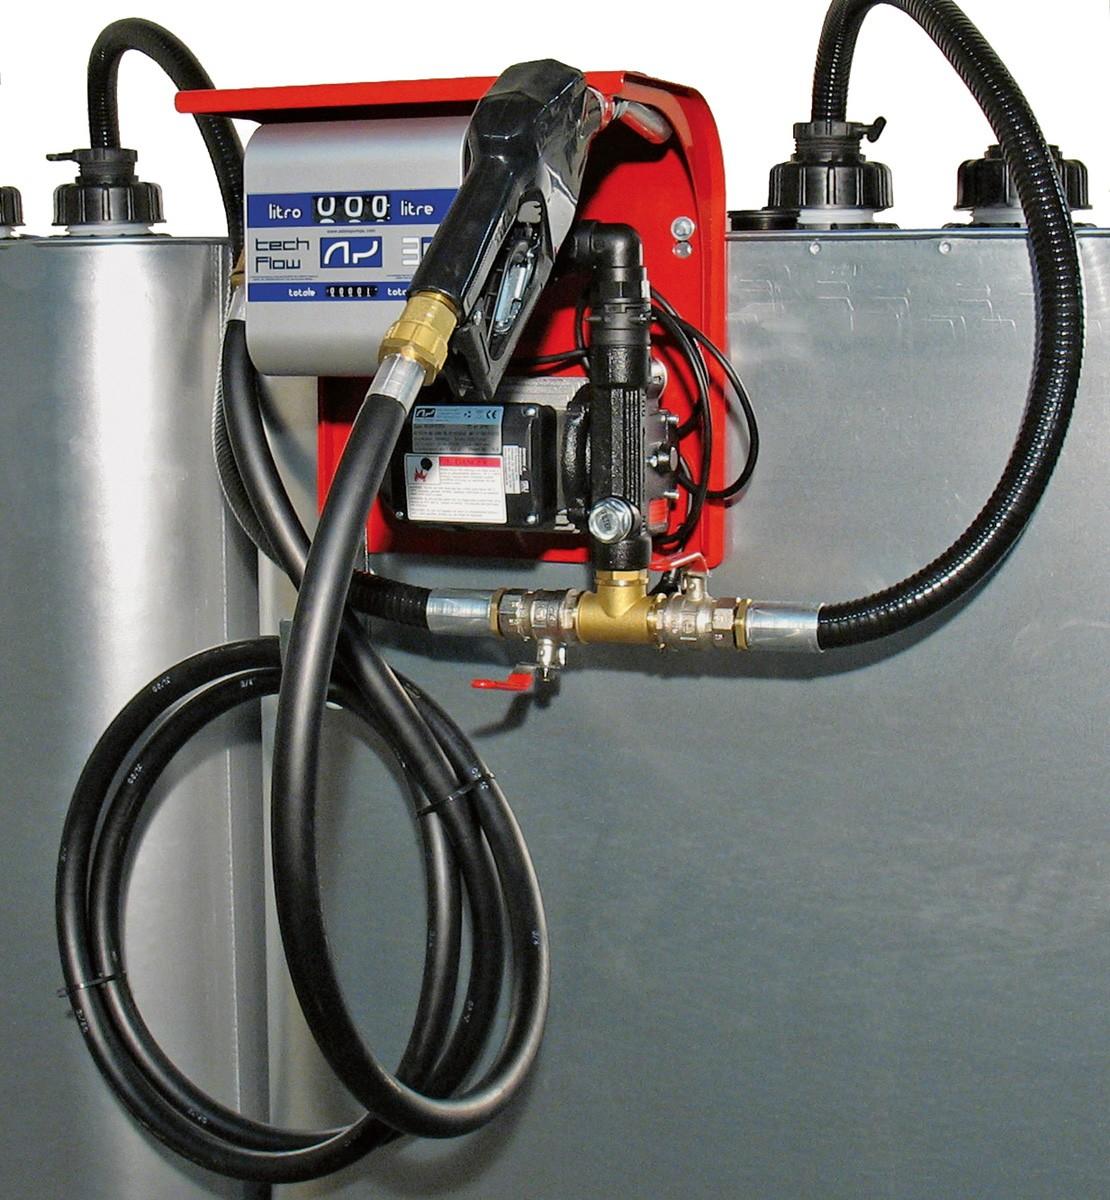 Kugelhahn Dieselpumpe Tankstelle Tanken Hoftankstelle Dieseltank Tank Dieseltank